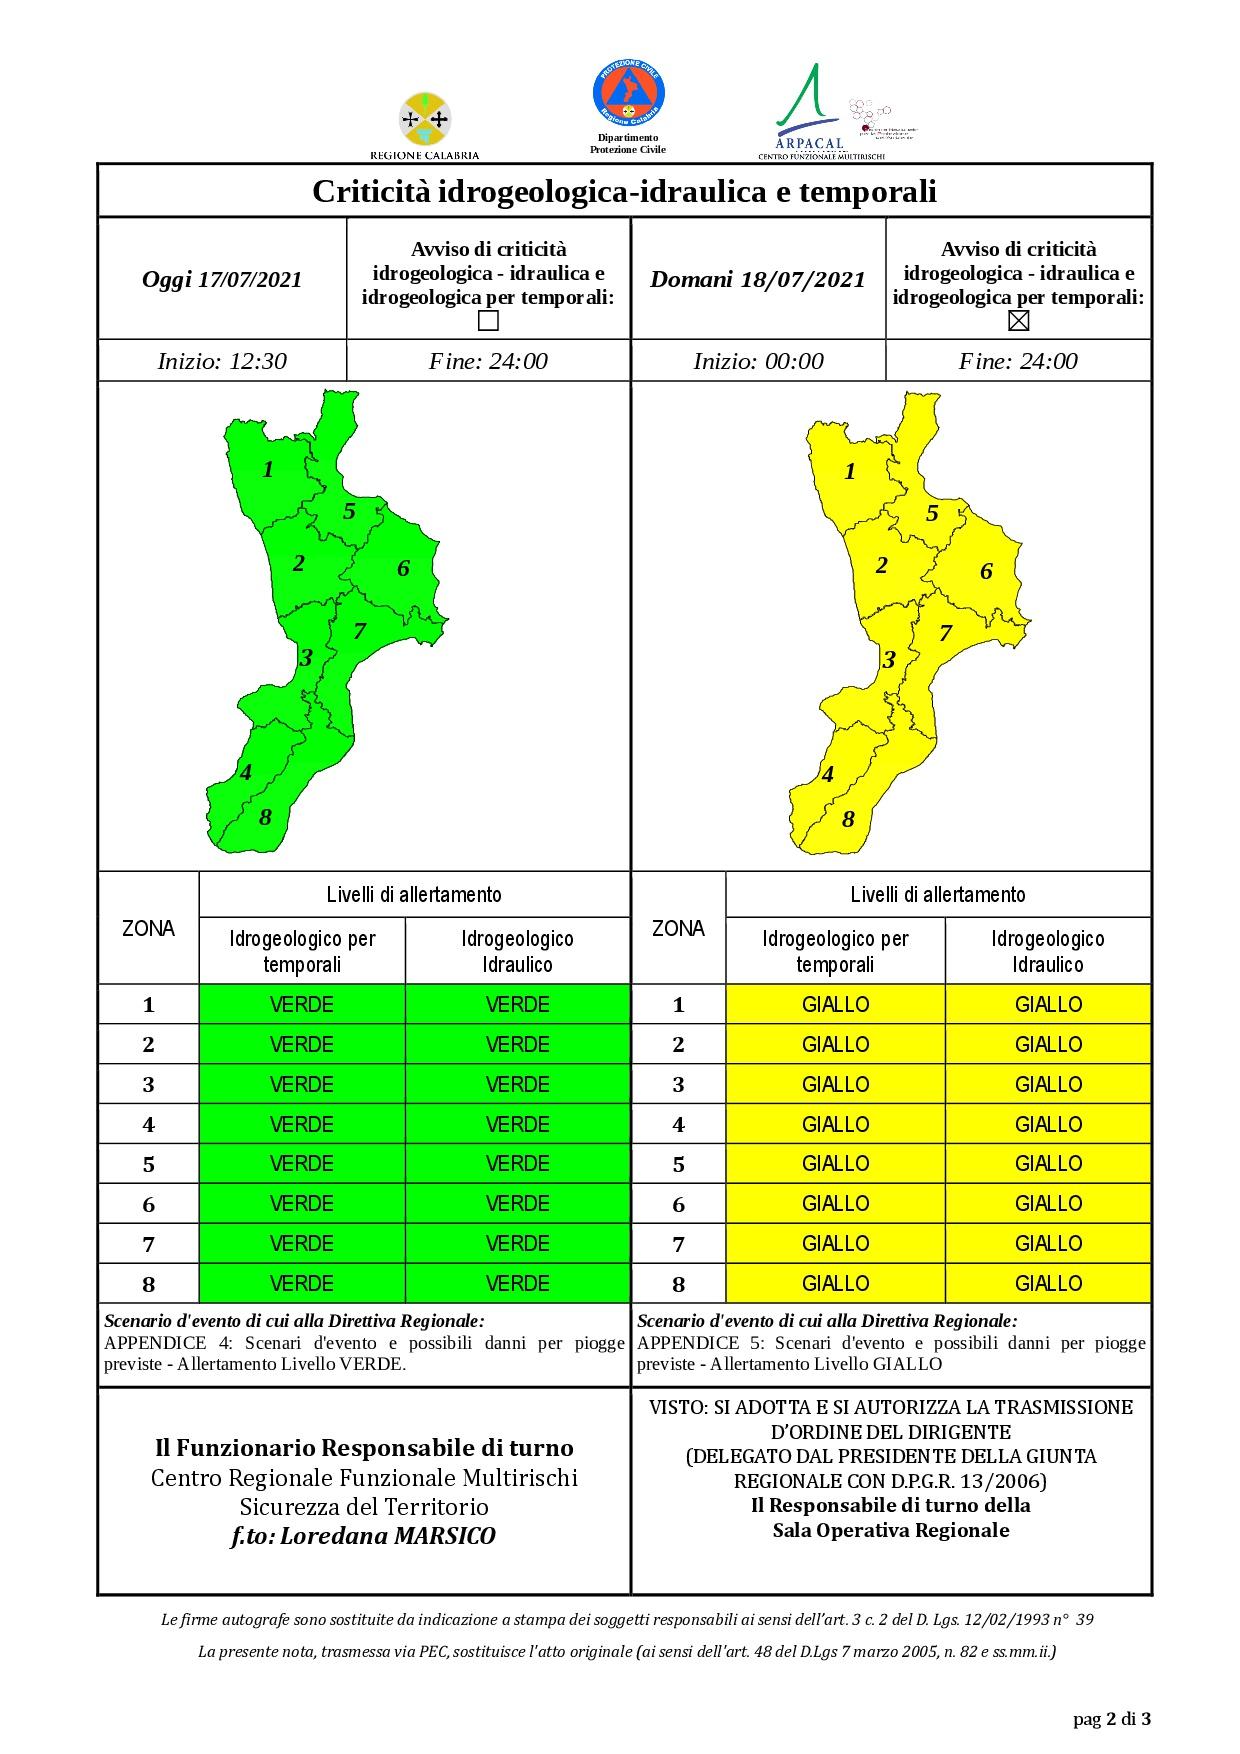 Criticità idrogeologica-idraulica e temporali in Calabria 17-07-2021